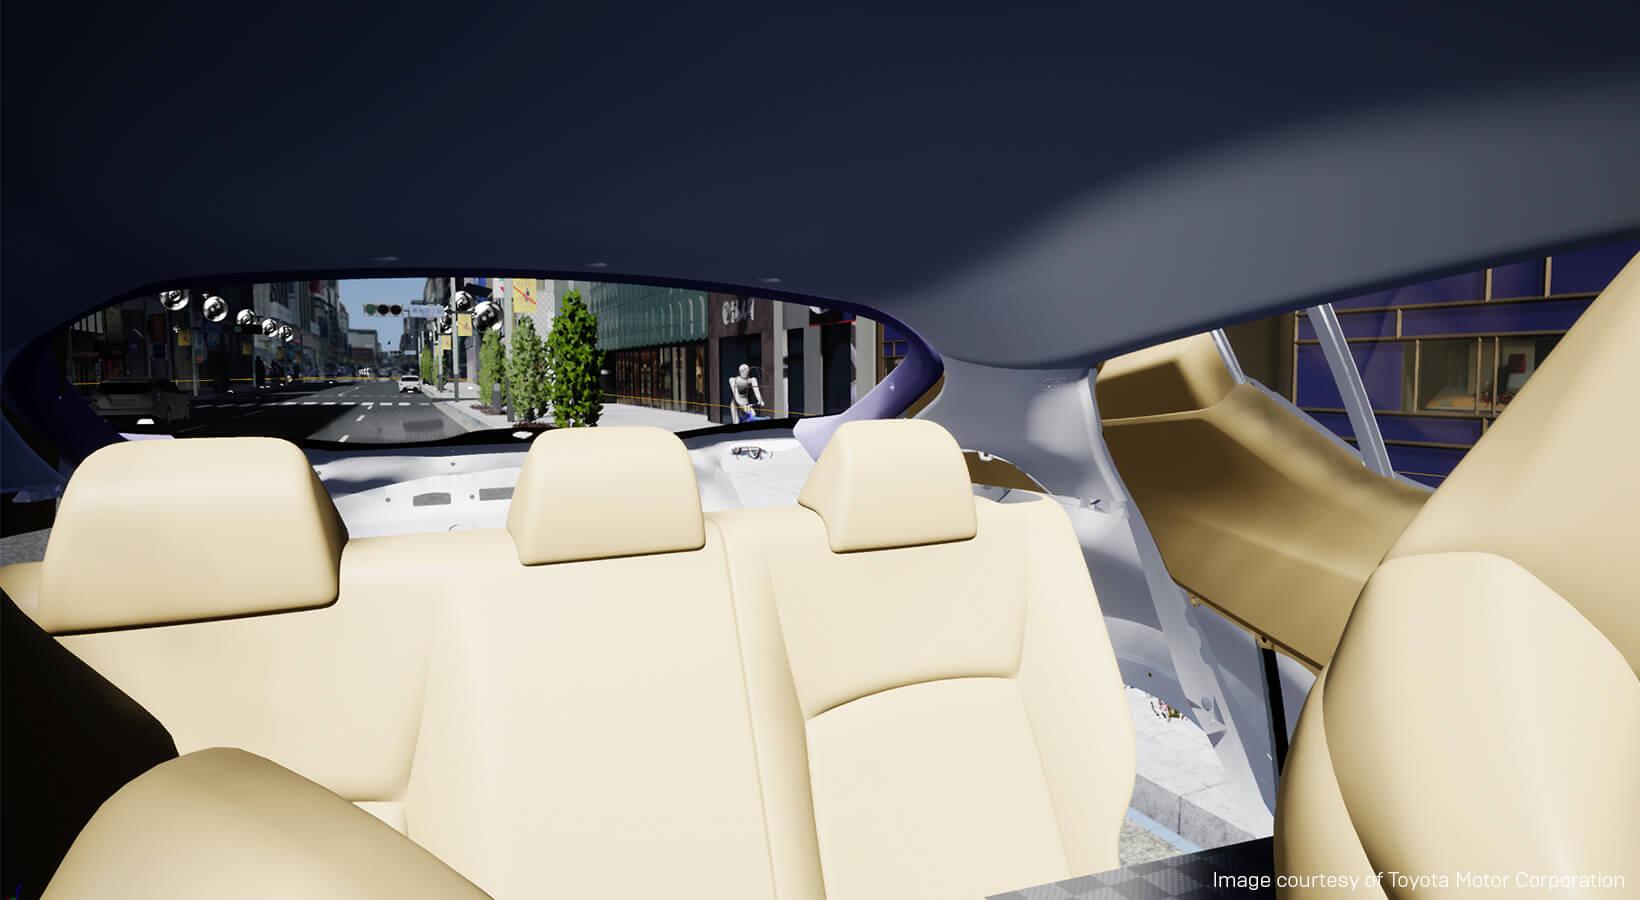 Spotlight_Toyota_Blog_Body_Image_6.jpg